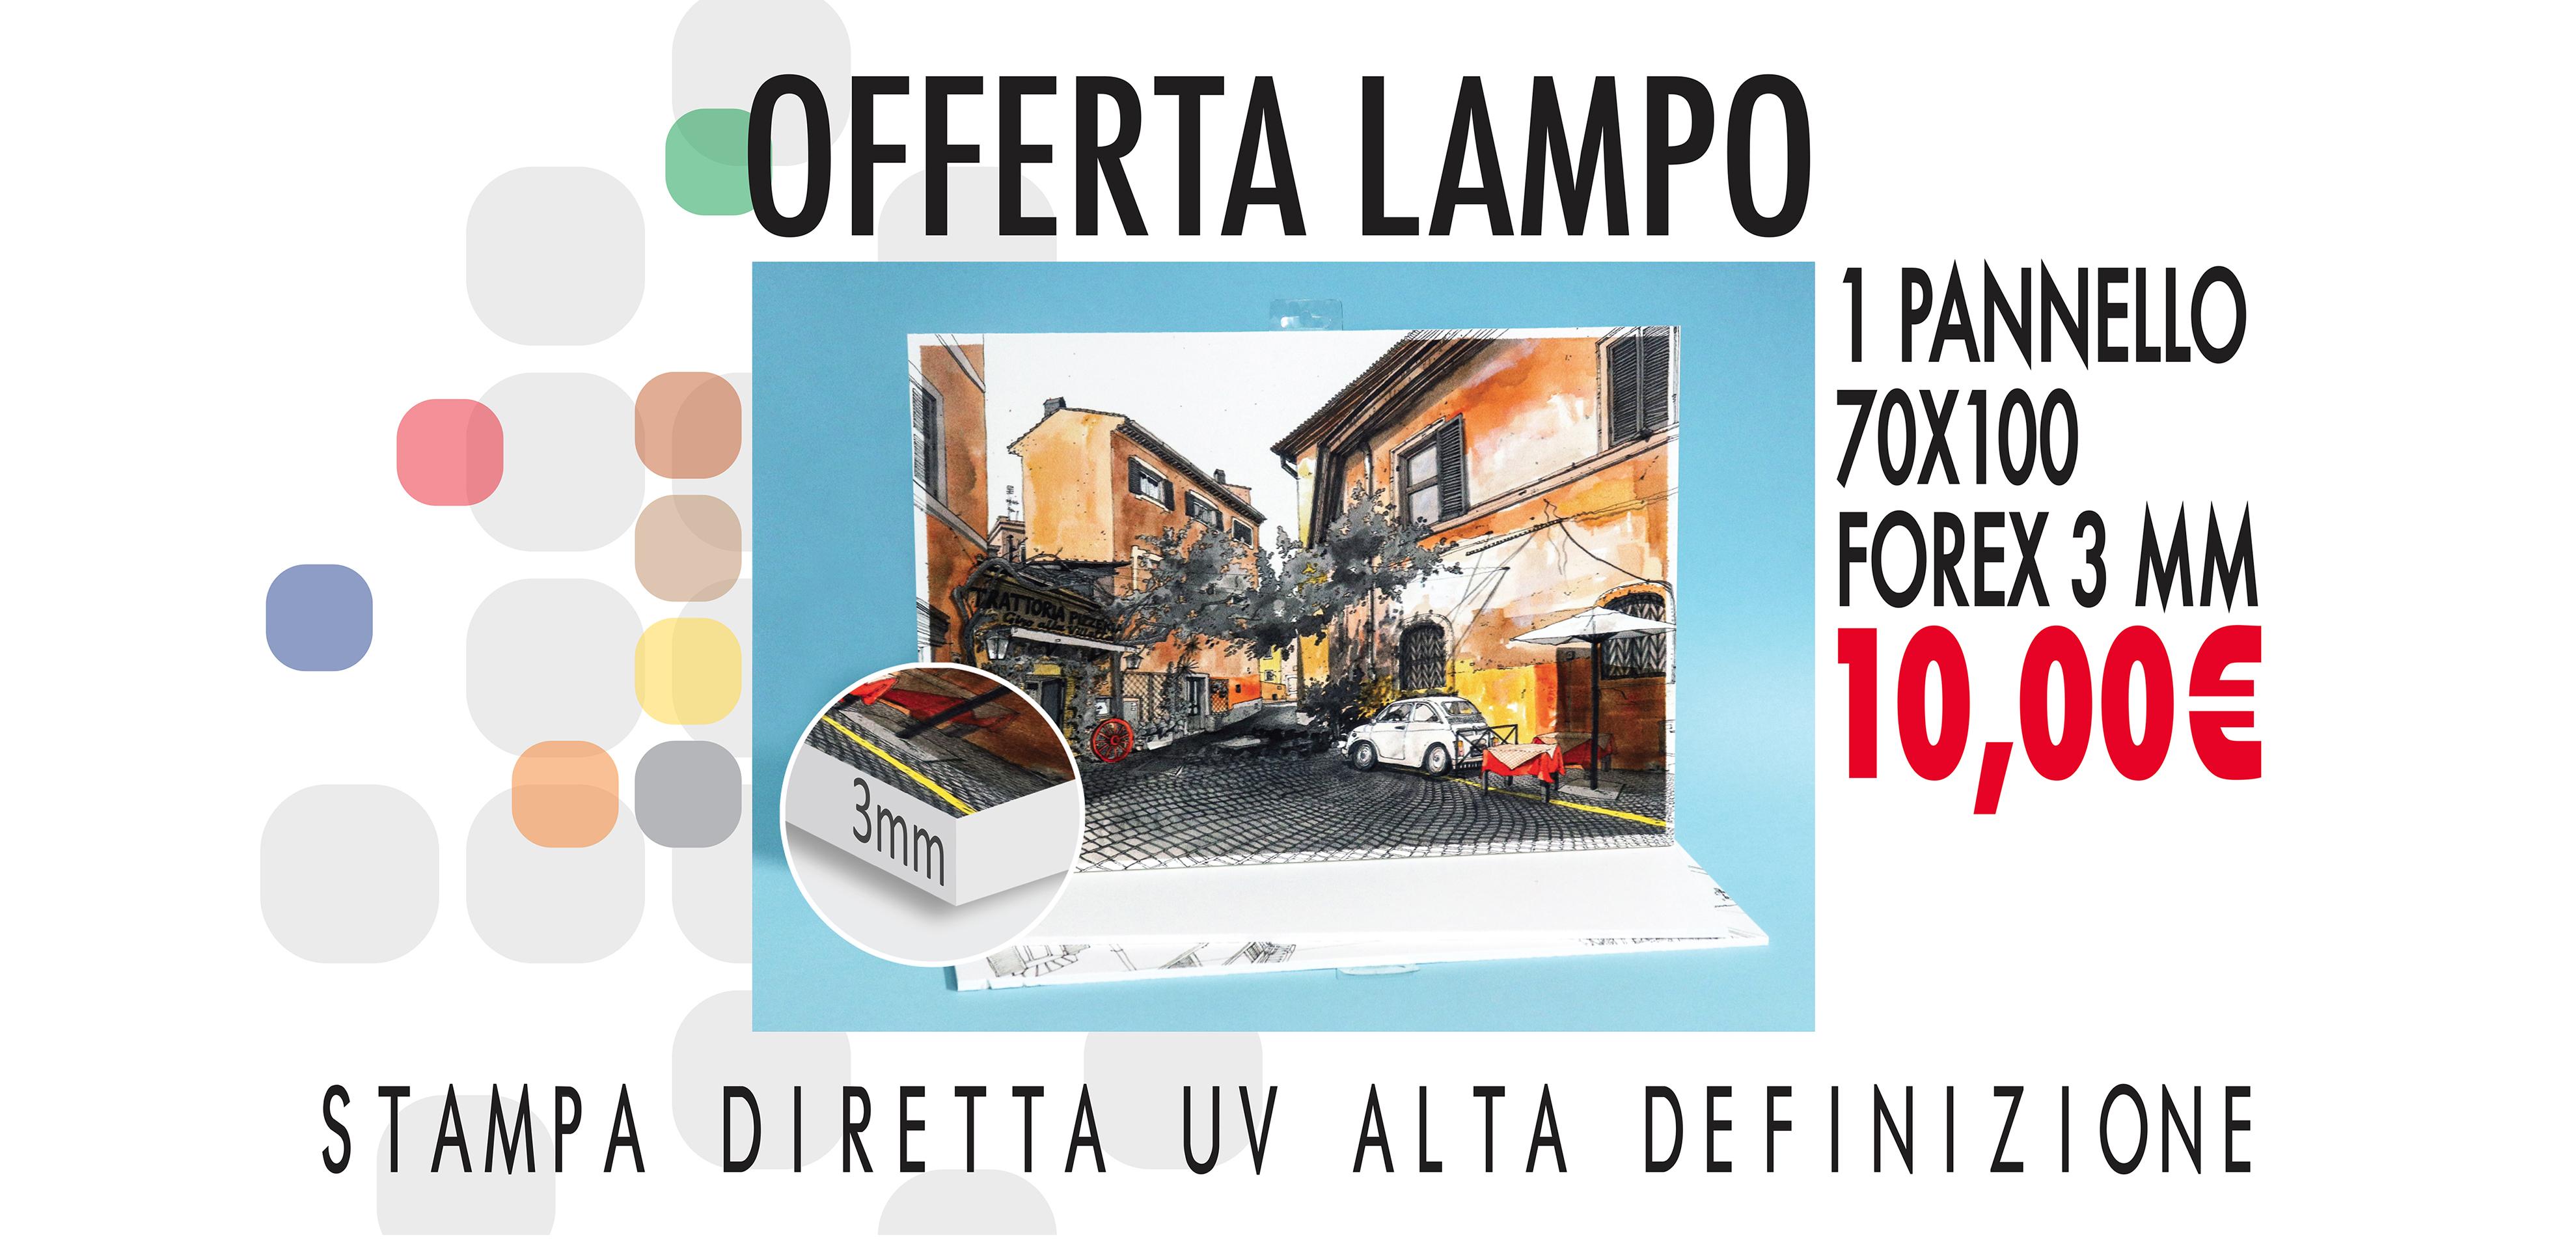 Offerta_Lampo_F03_70x100